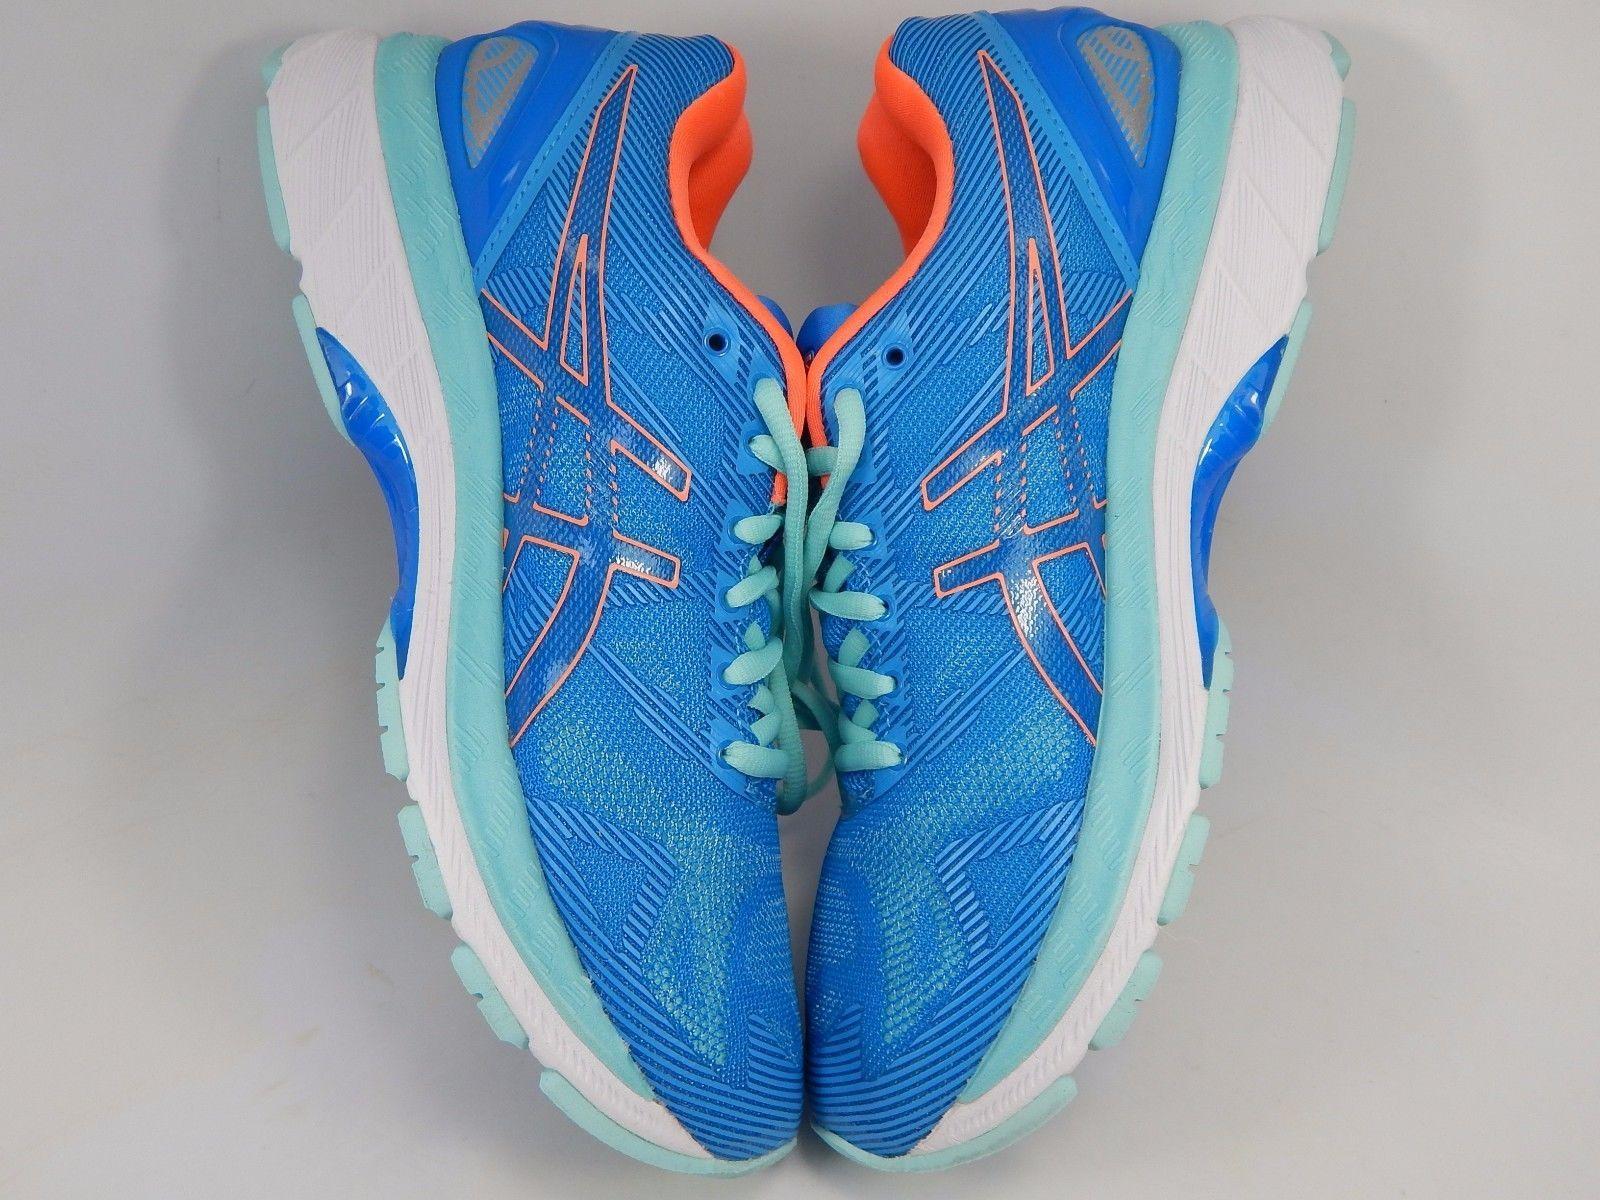 Asics Gel Nimbus 19 Women's Running Shoes Size US 9.5 M (B) EU 41.5 Blue T750N